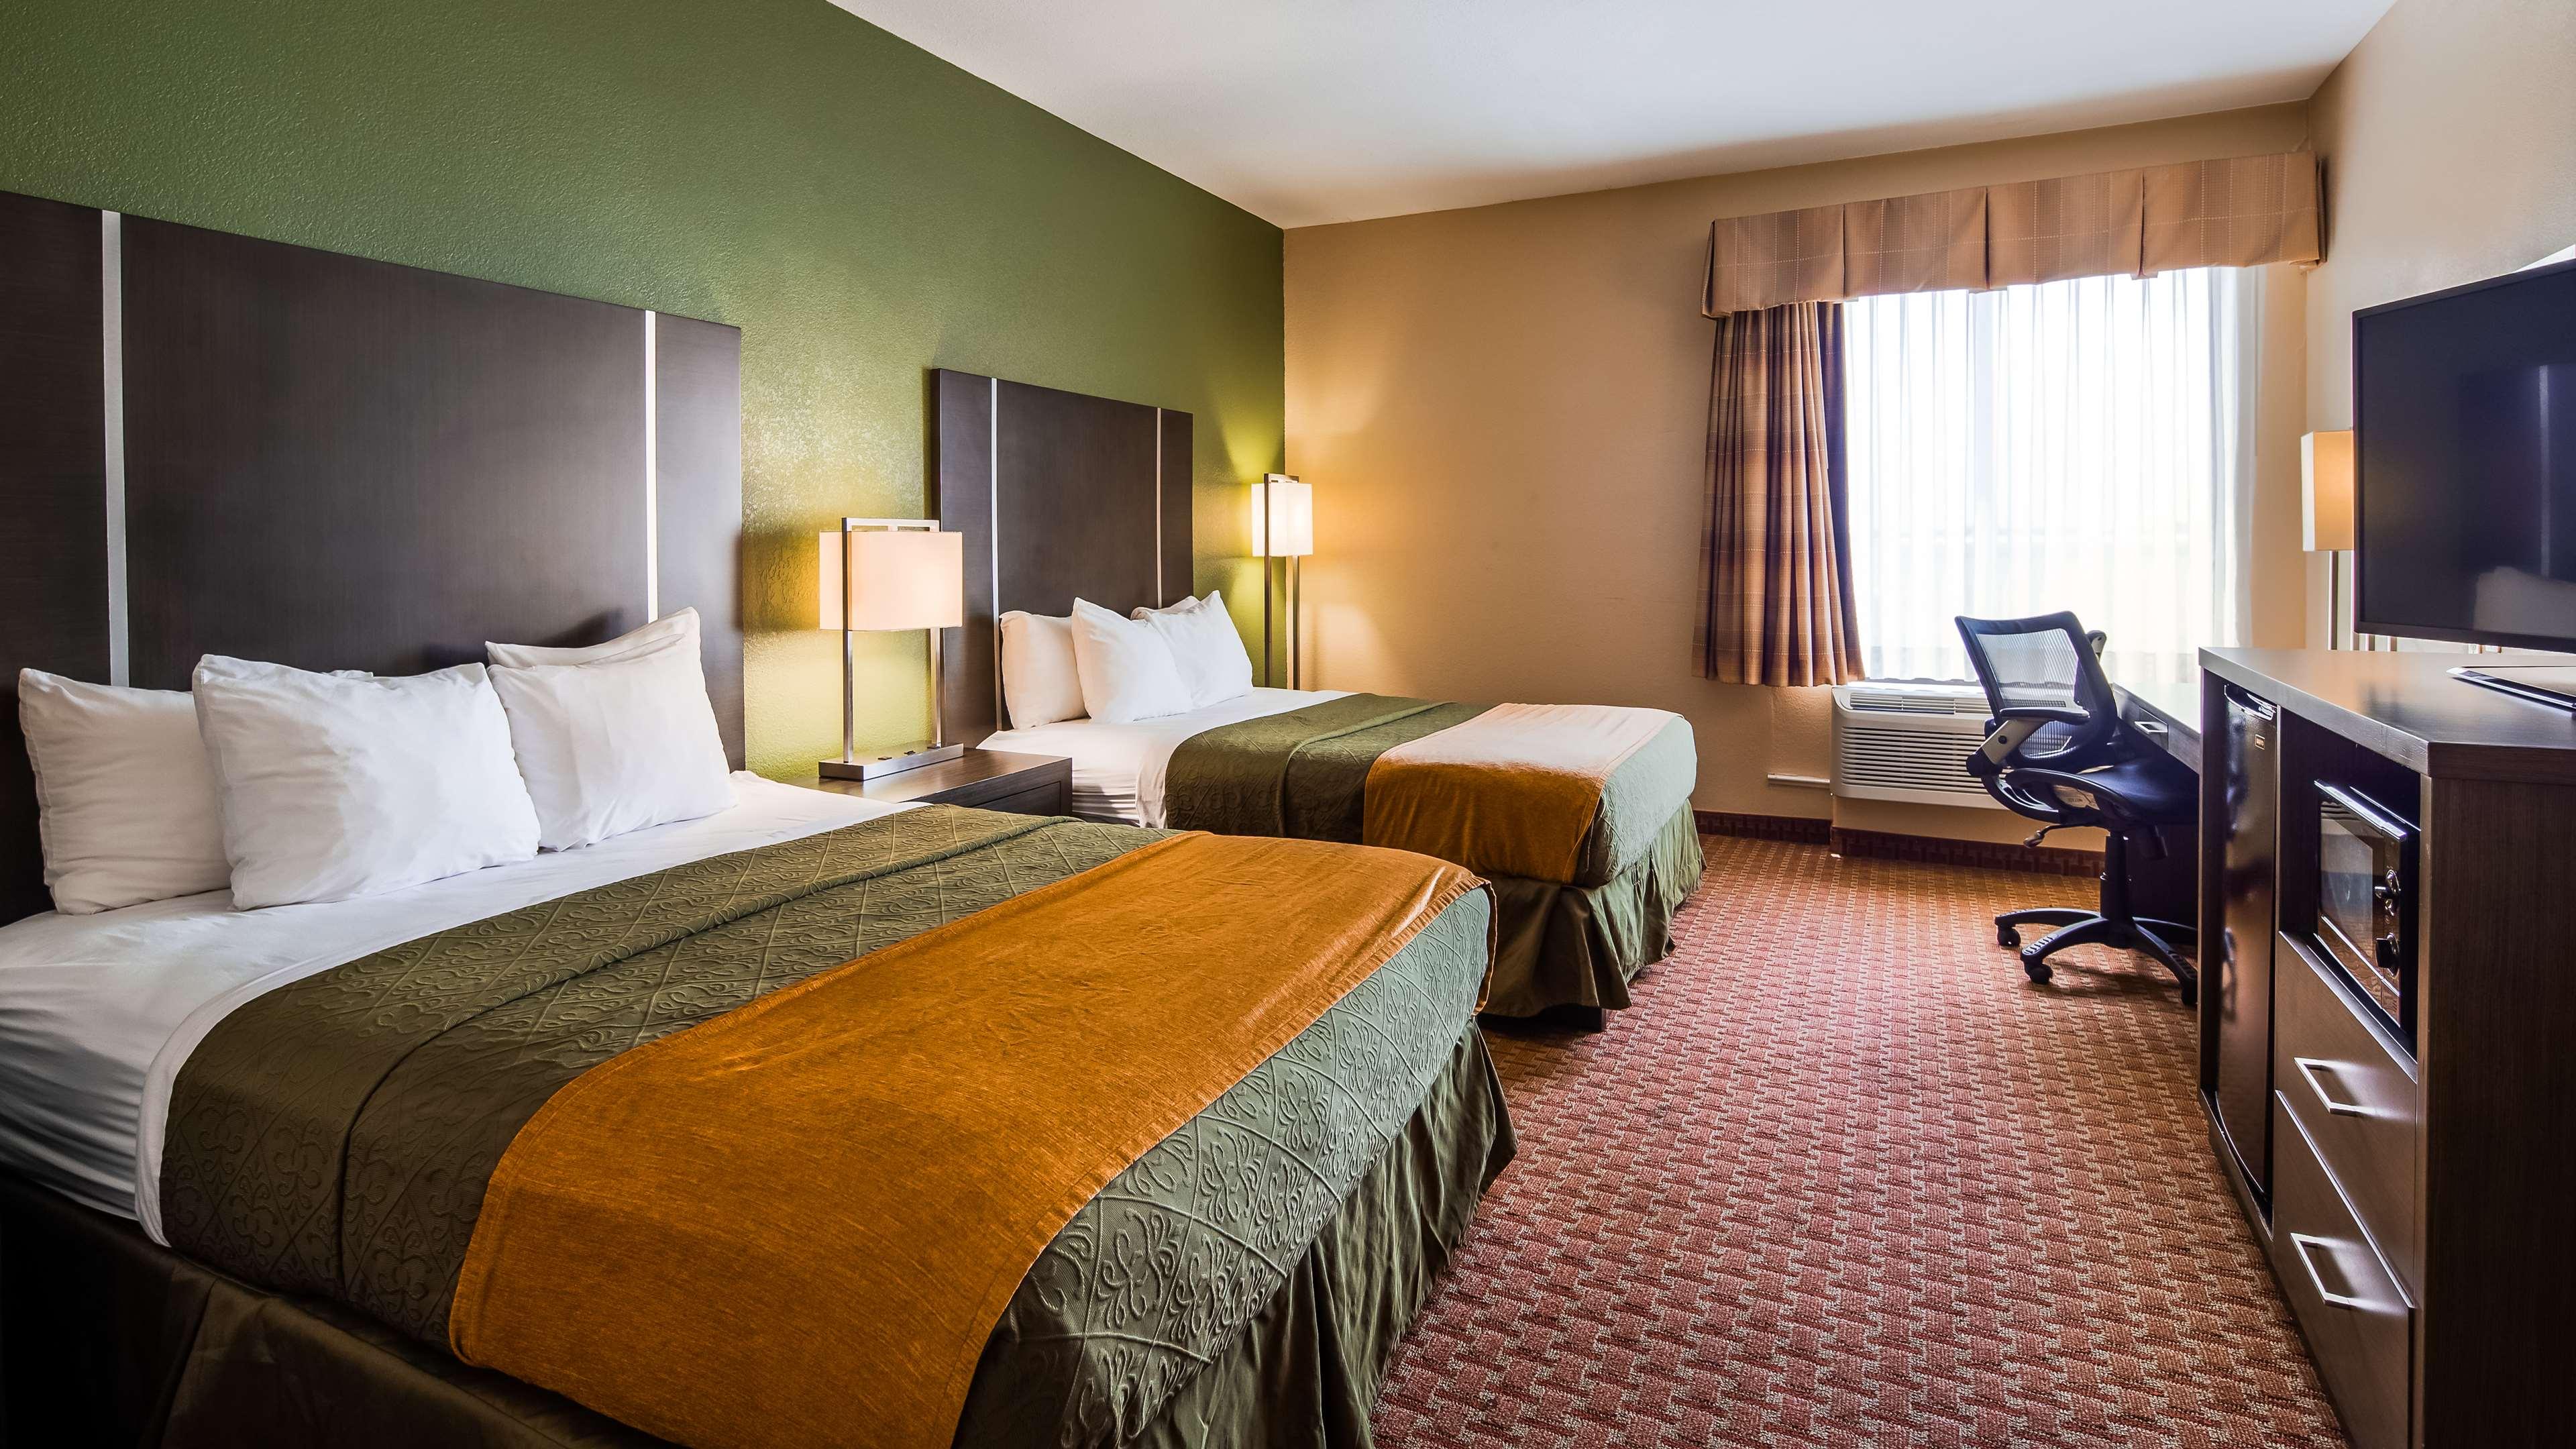 Best Western Plus North Houston Inn & Suites image 21